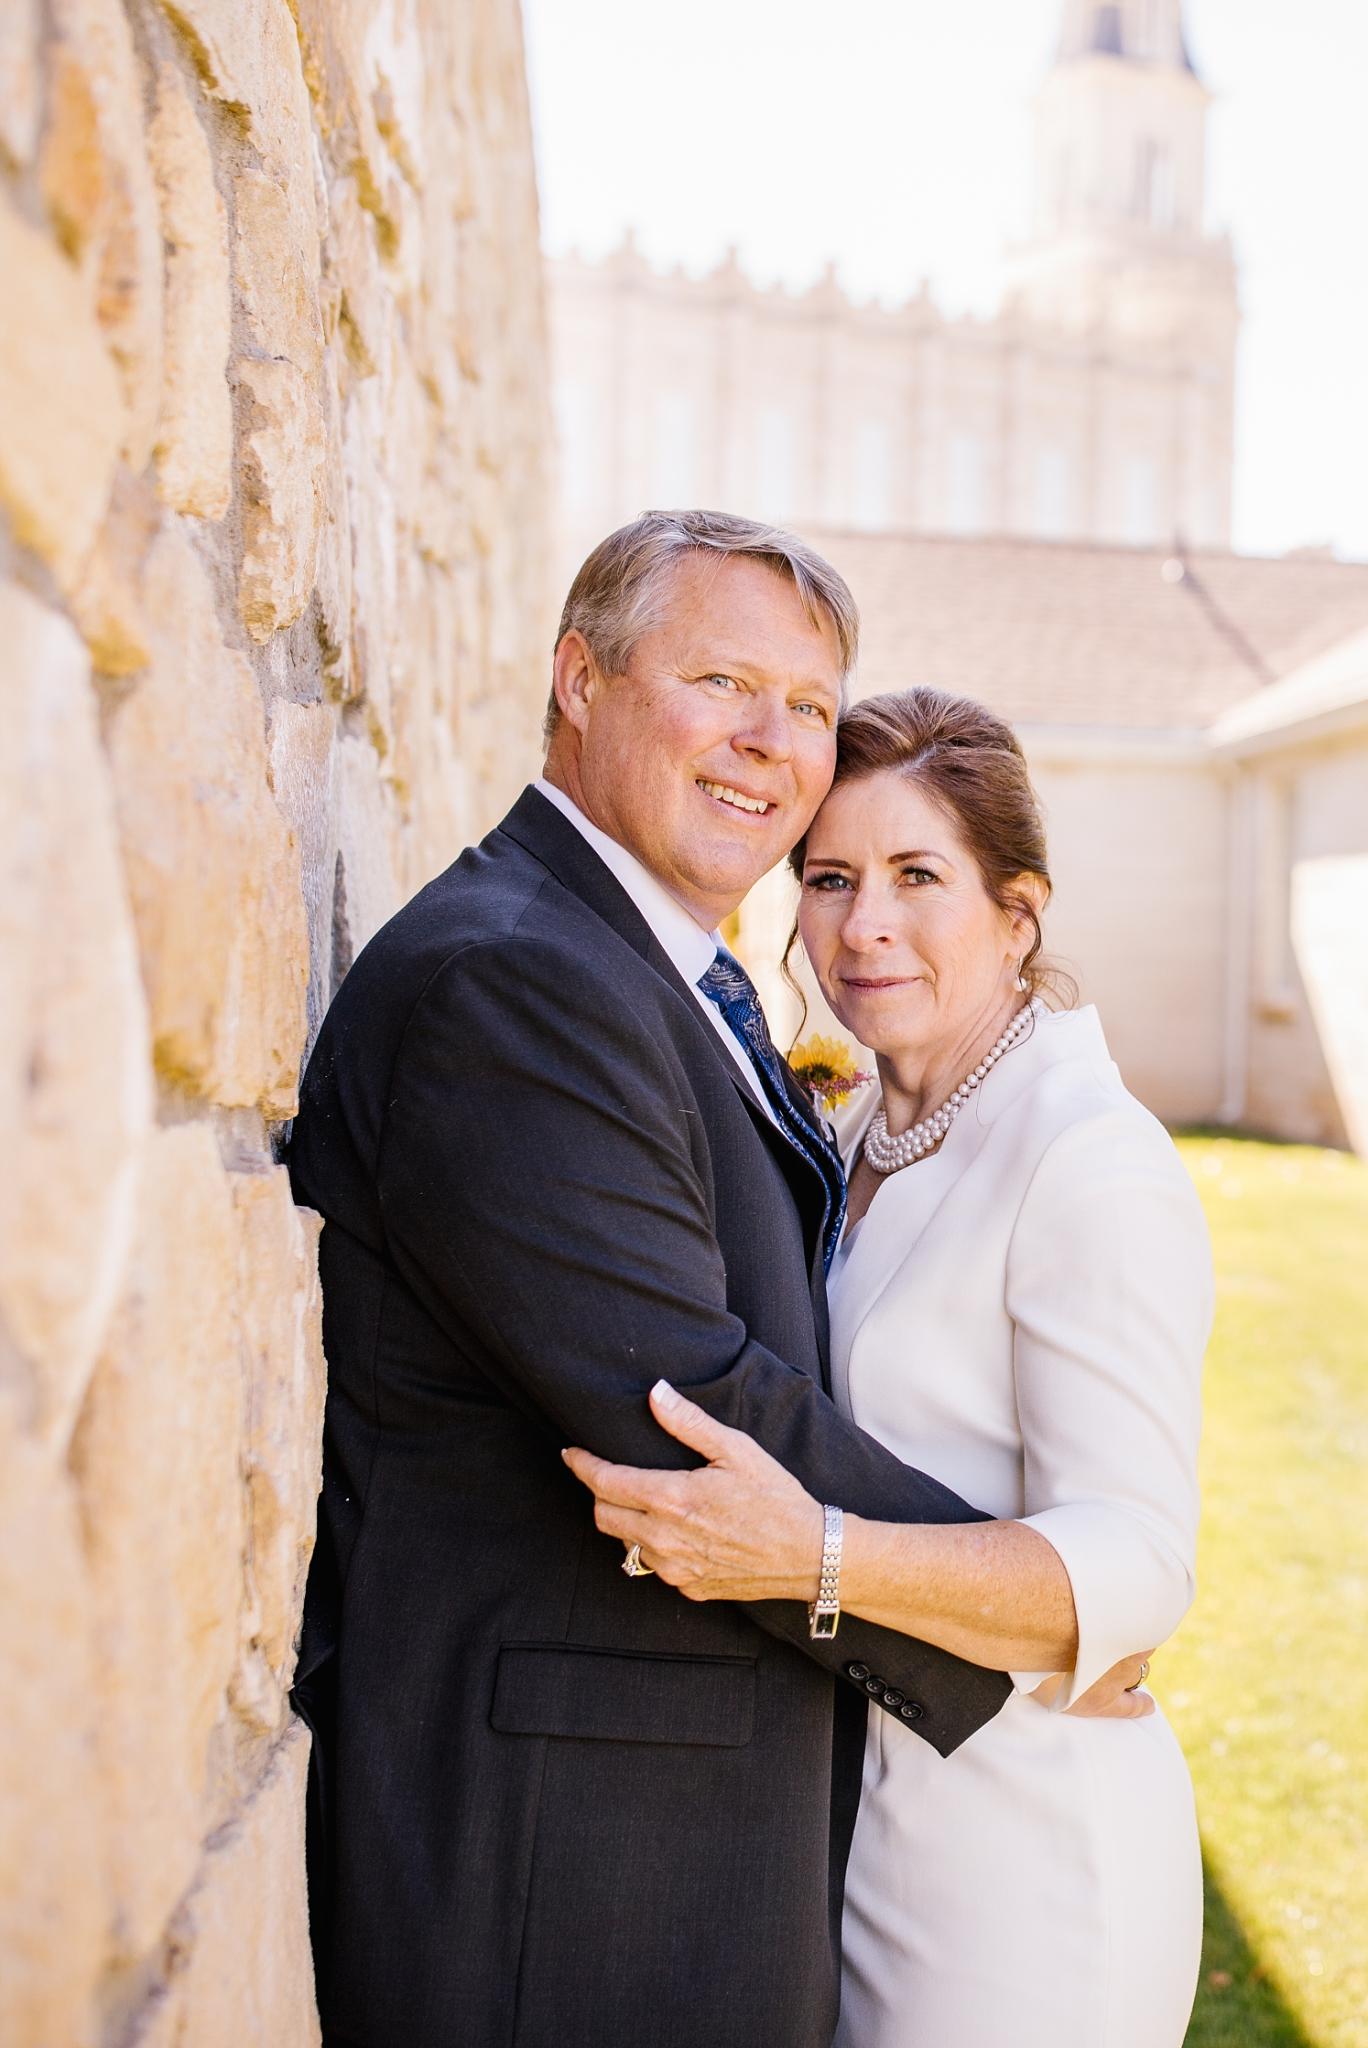 PDWeddingDay-145_Lizzie-B-Imagery-Utah-Wedding-Photographer-Park-City-Salt-Lake-City-Manti-Utah-Temple.jpg